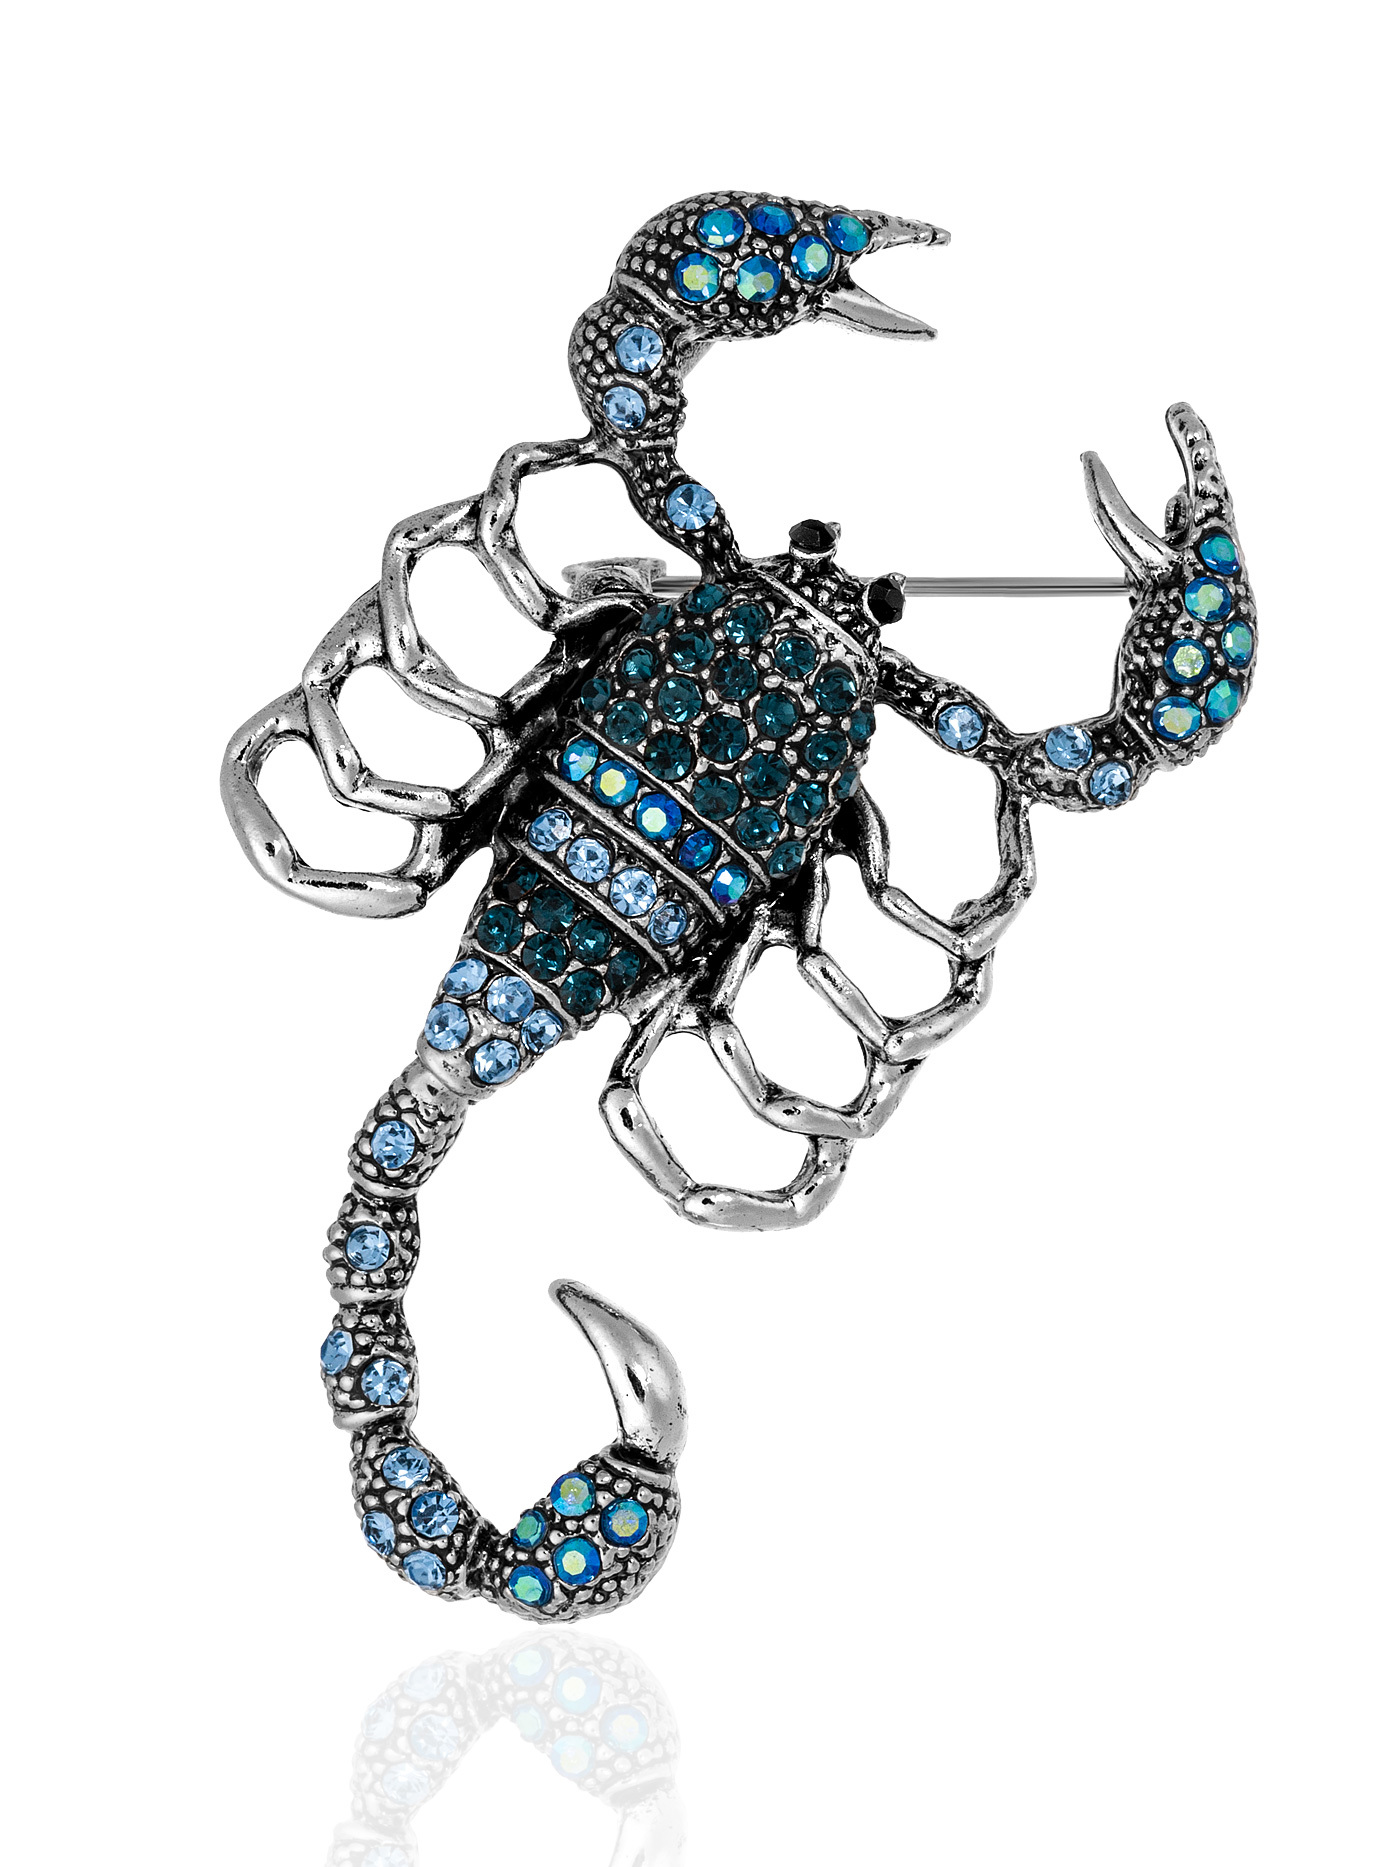 Брошь Скорпион с кристаллами